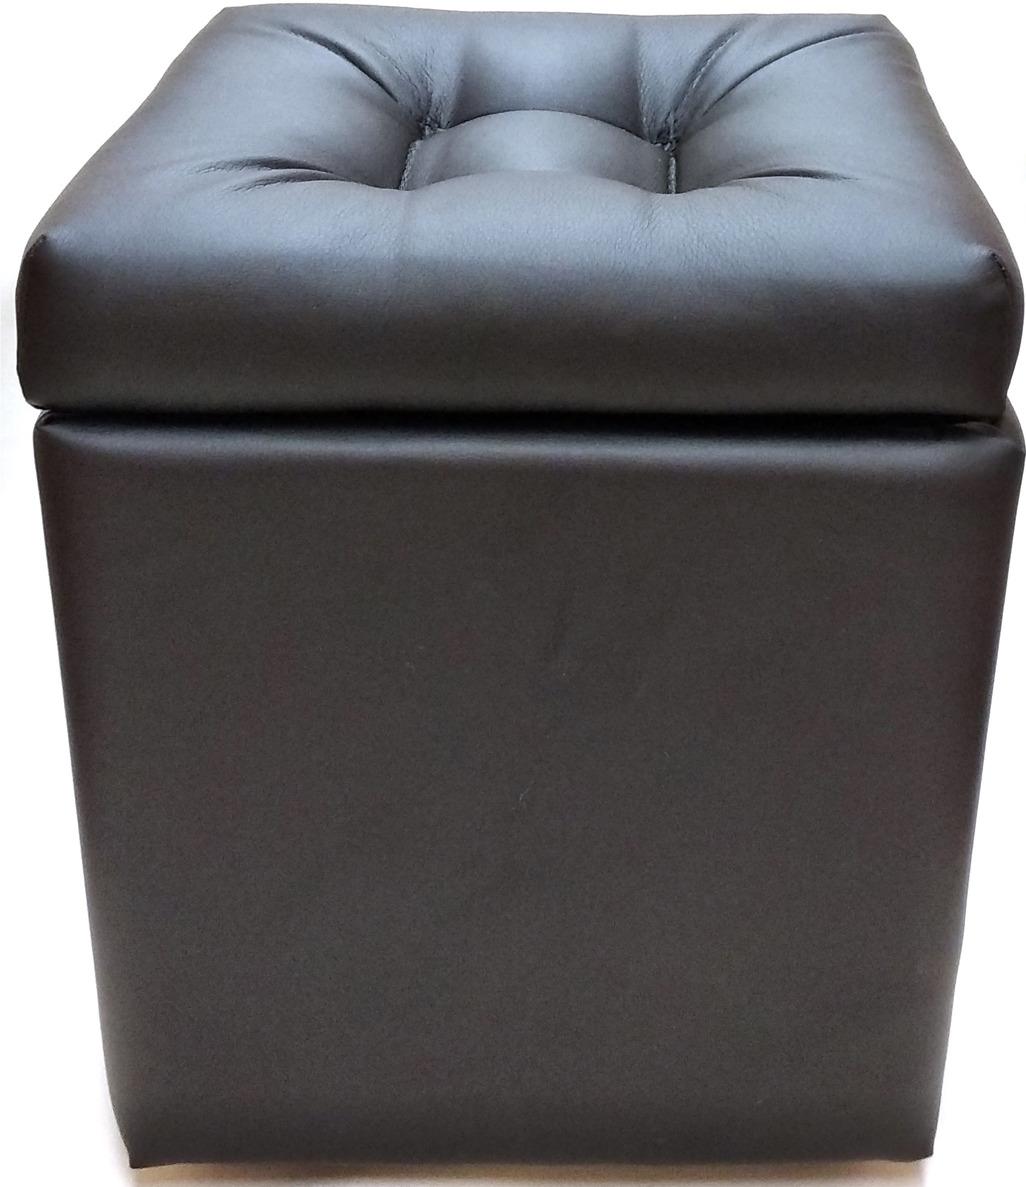 Пуф-короб Auto Premium, с крышкой, 57552, черный, 38 х 38 х 38 см пуф короб для хранения homemaster париж 76 х 38 х 38 см